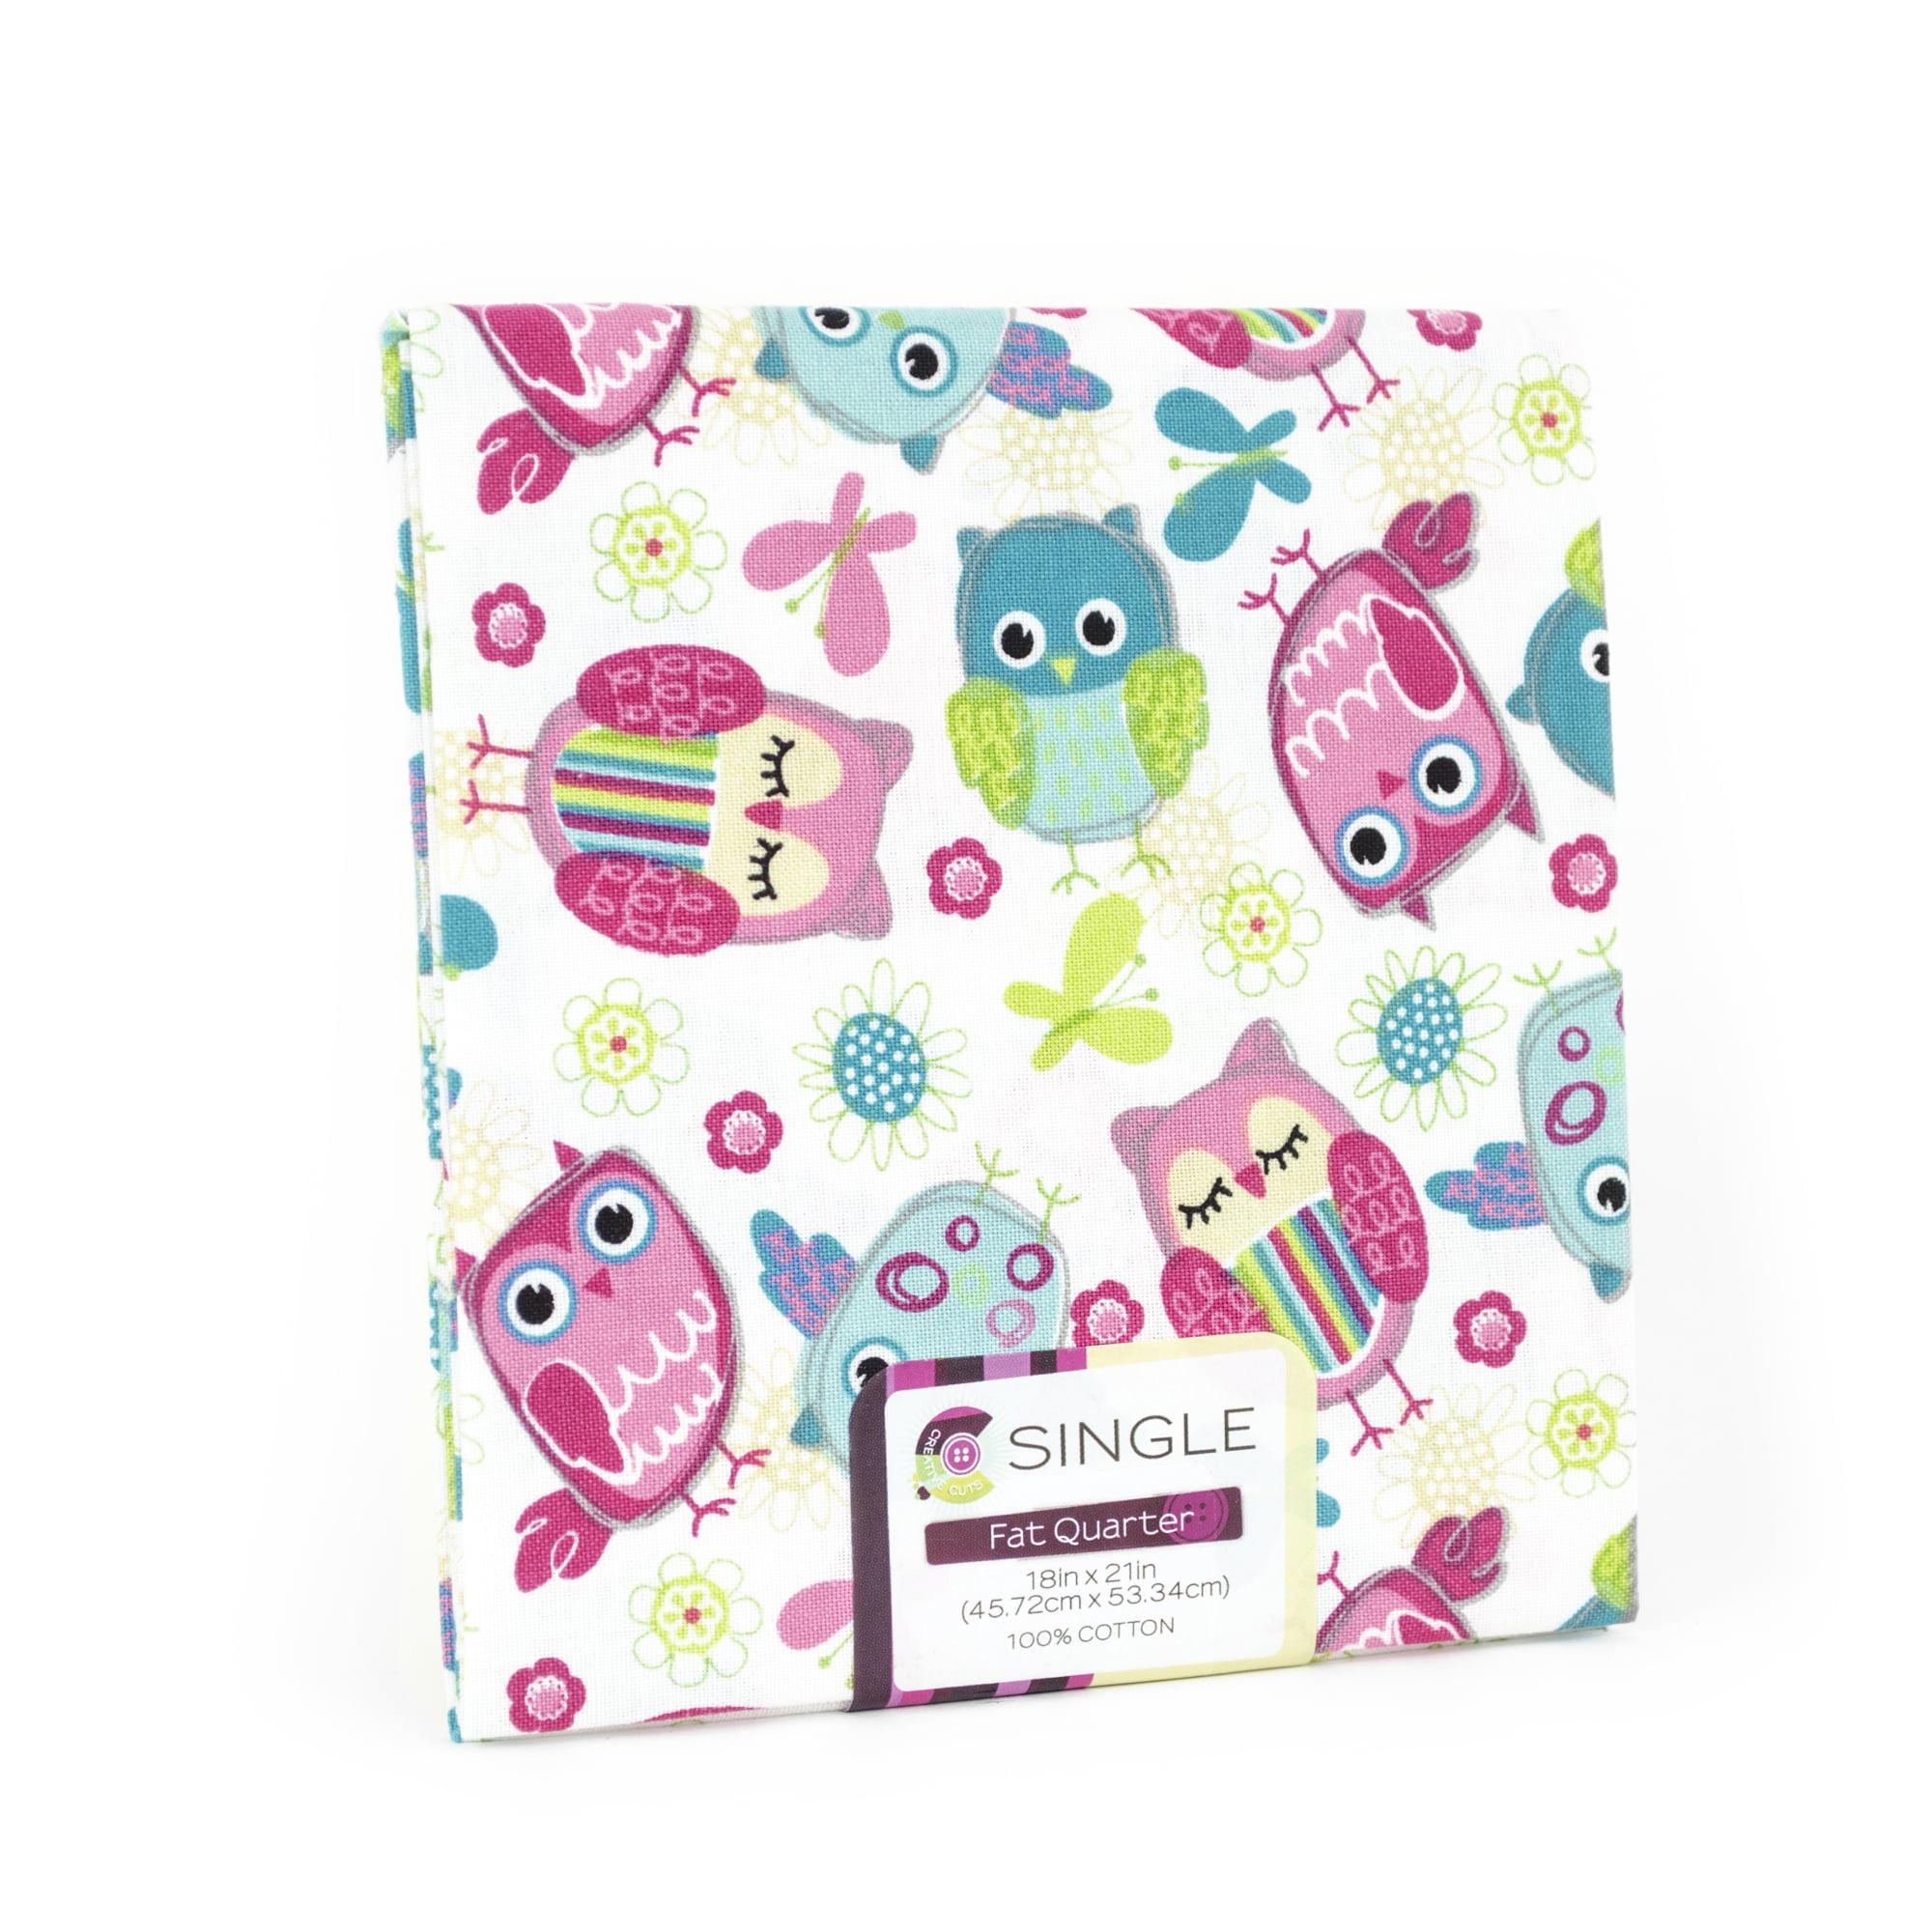 "Fabric Editions- Cotton Fabric, Fat Quarter, 18"" x 21"" OWL ..."